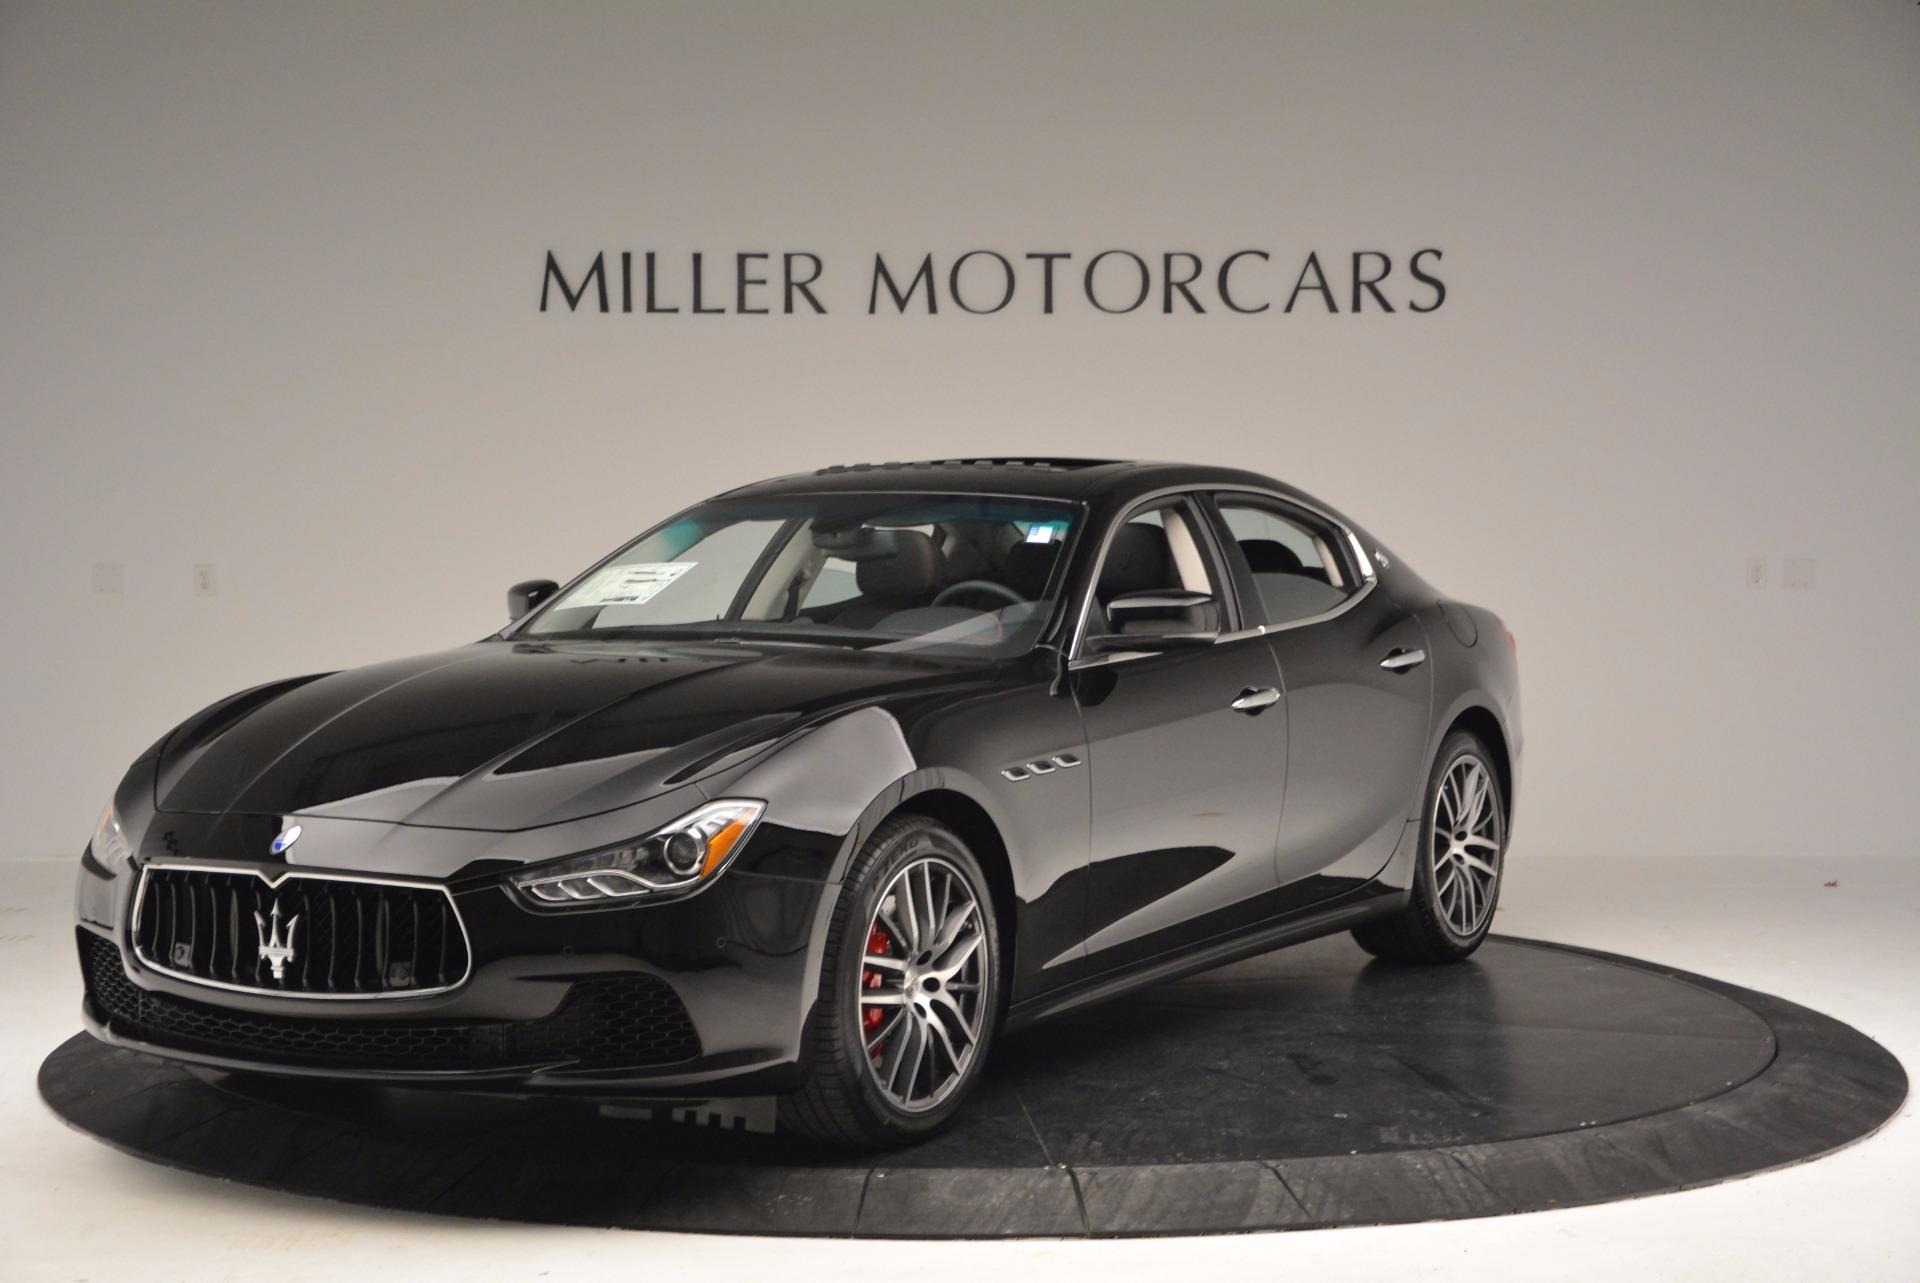 New 2017 Maserati Ghibli S Q4 For Sale In Greenwich, CT 1038_main